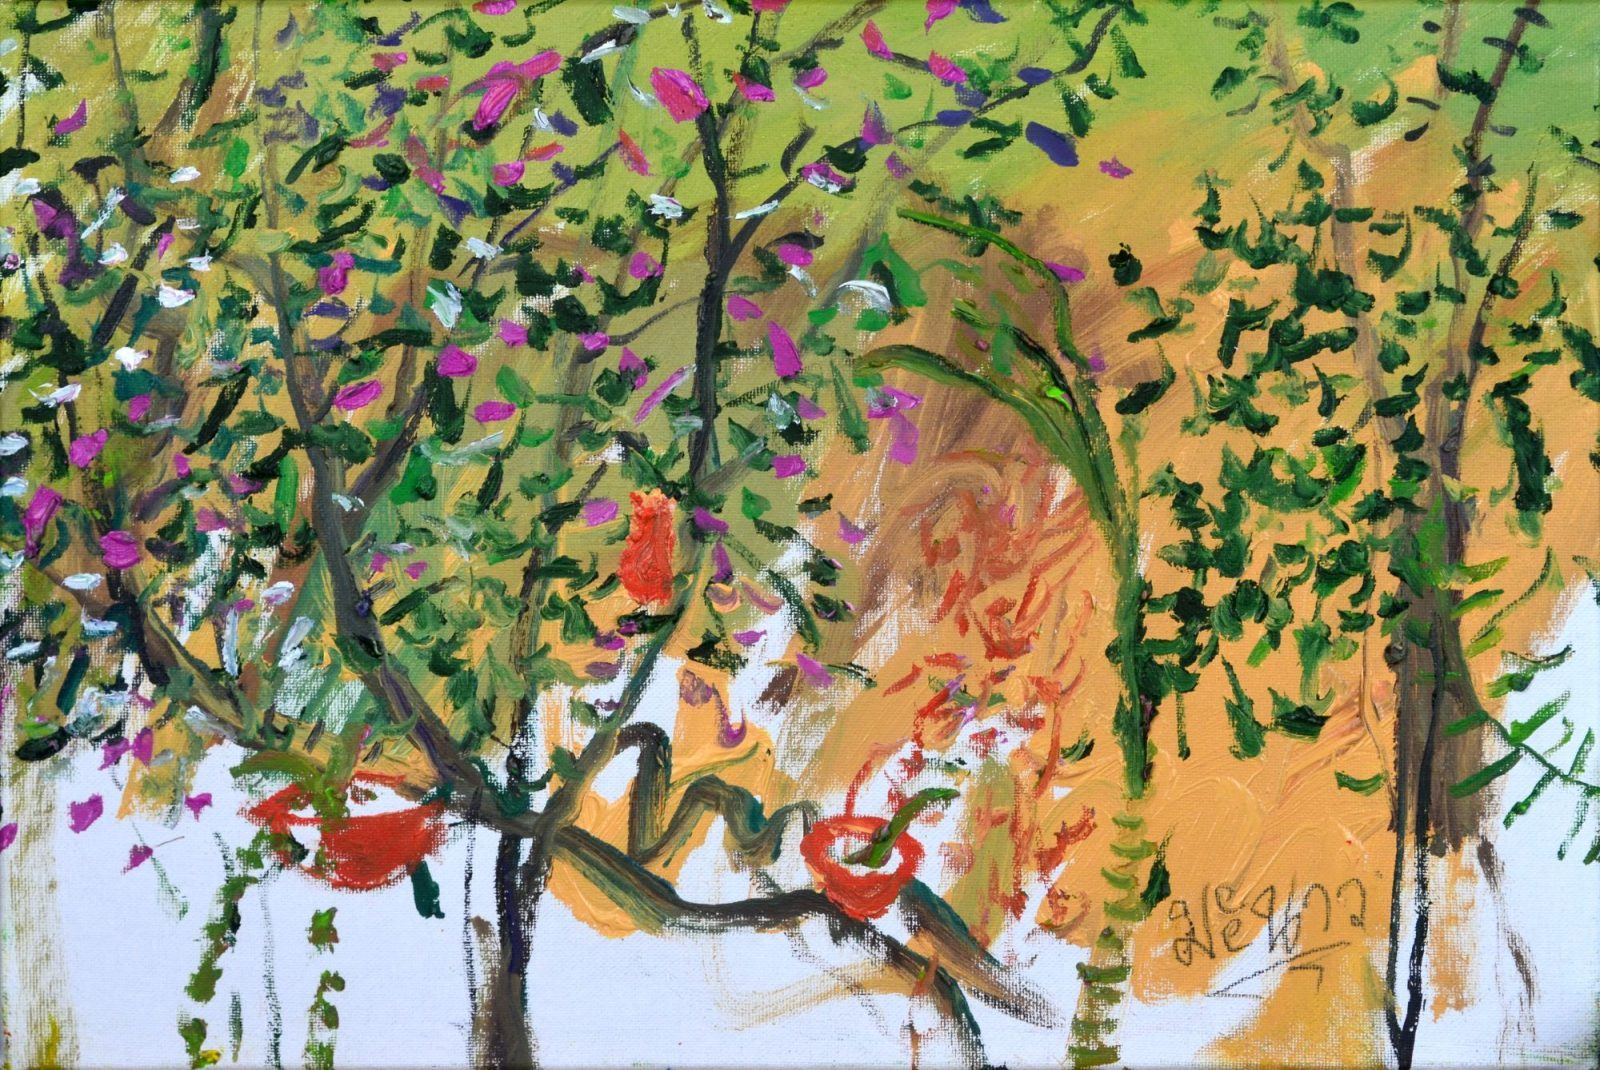 franyo aatoth: Garden Series 11.